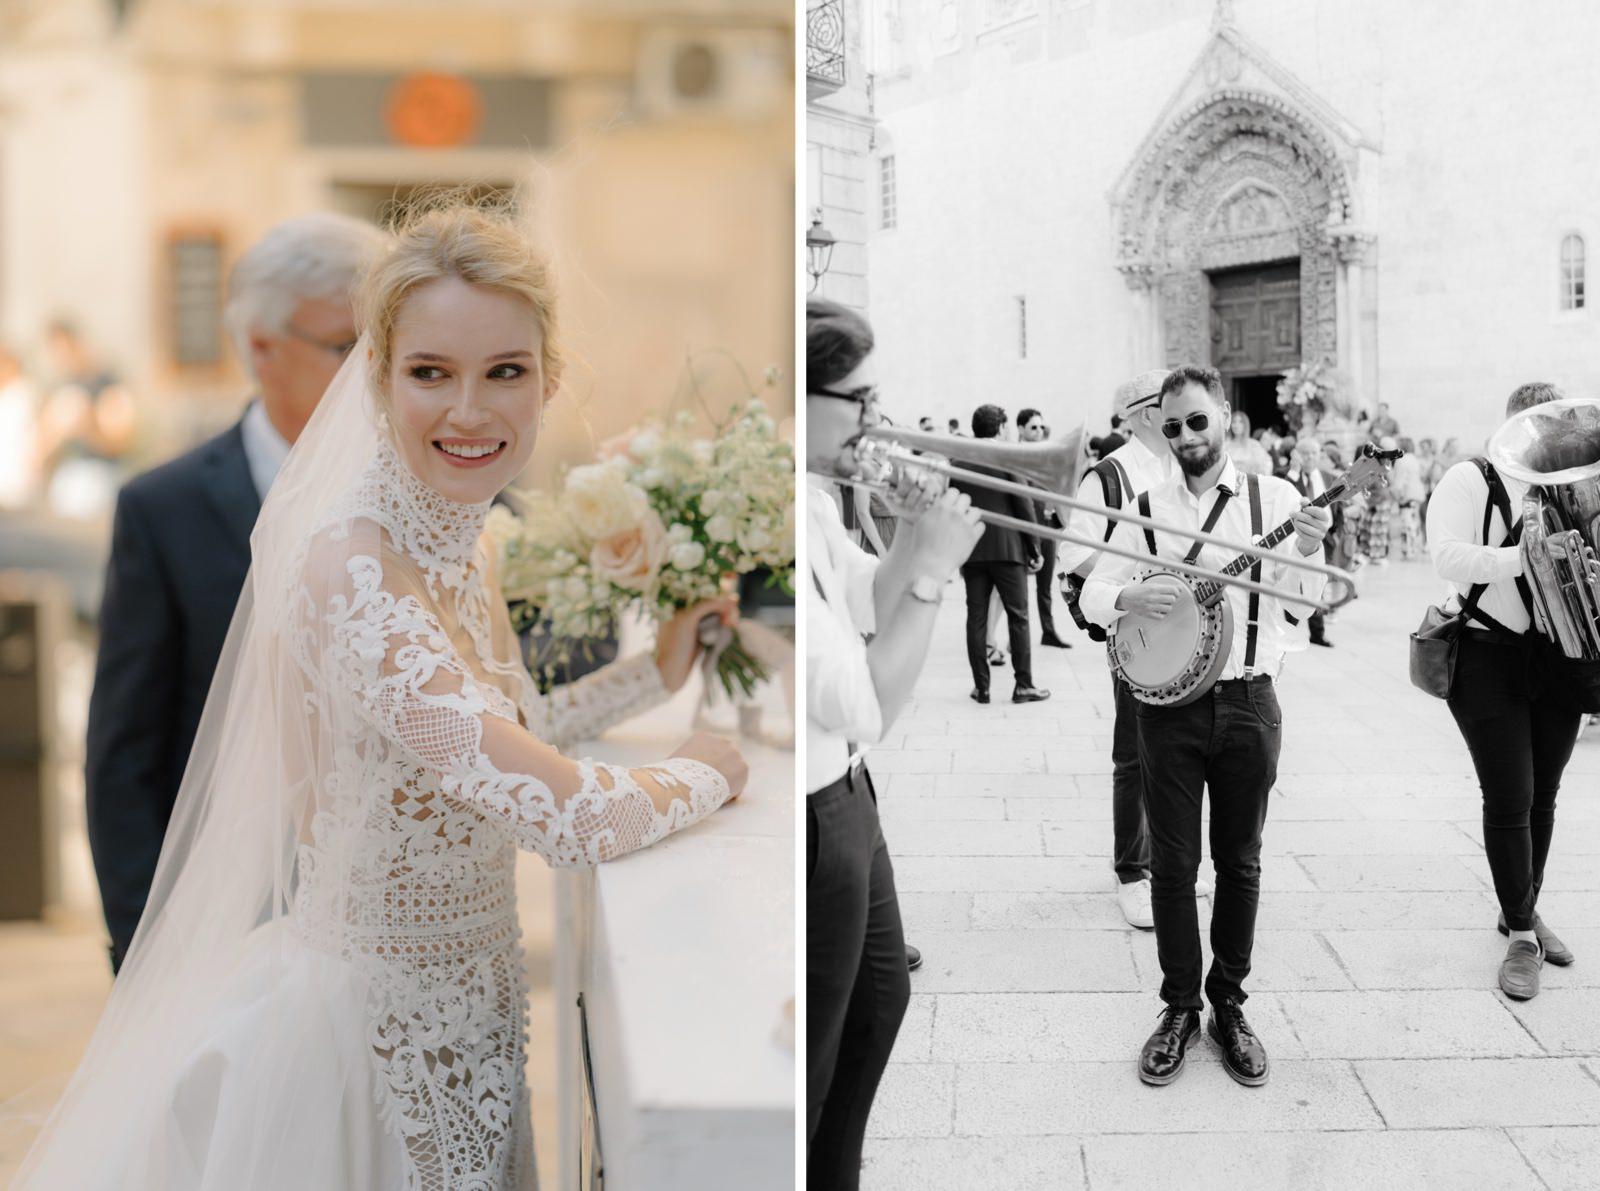 Origami inspired wedding - Lea-Ann Belter Ivy gown - Lea-Ann ... | 1191x1600